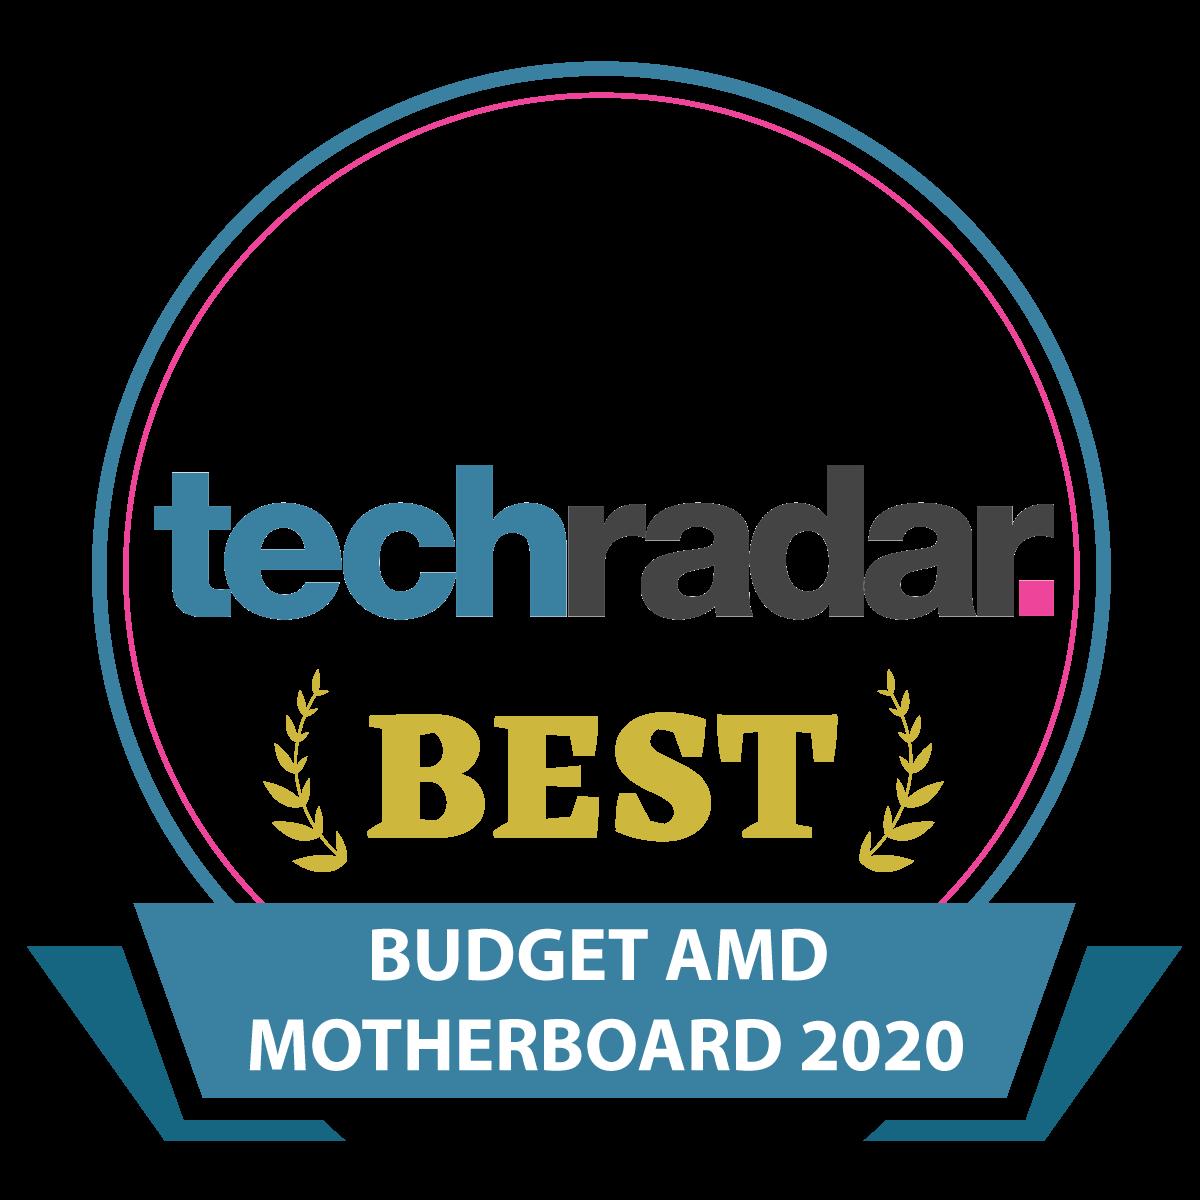 Techradar Best budget AMD motherboard